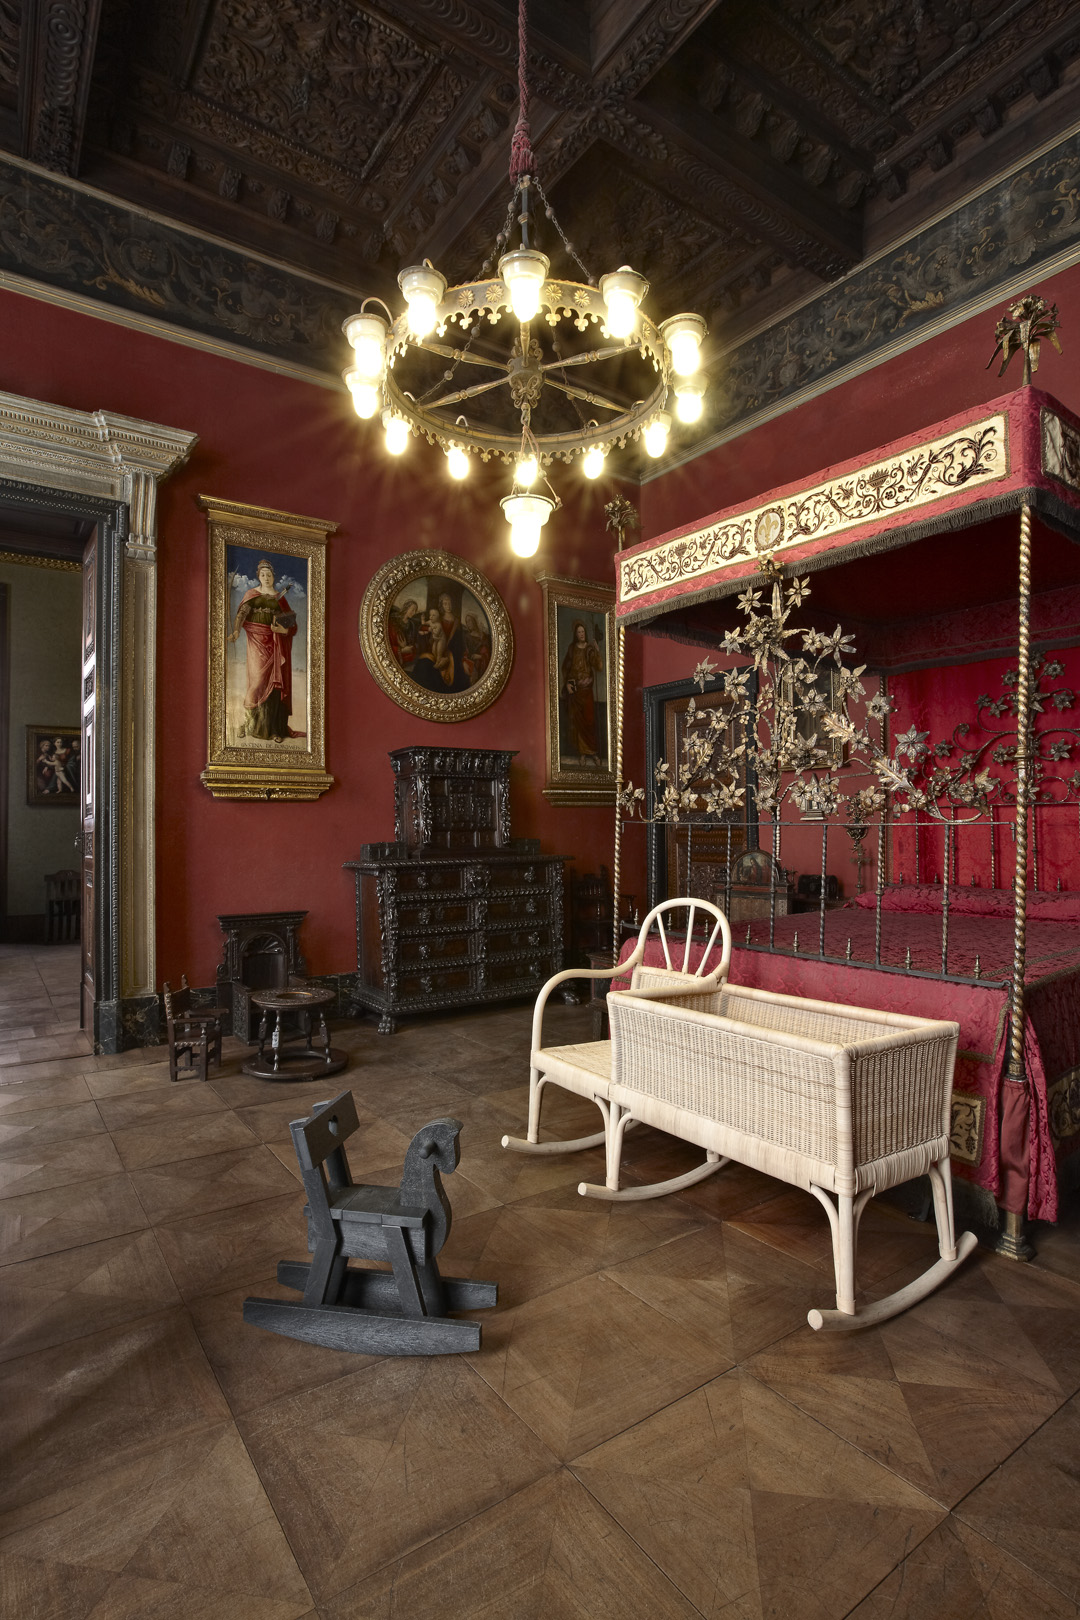 https://www.pasqualeformisano.com/wp-content/uploads/2016/11/Museo_Bagatti_Valsecchi_11.jpg